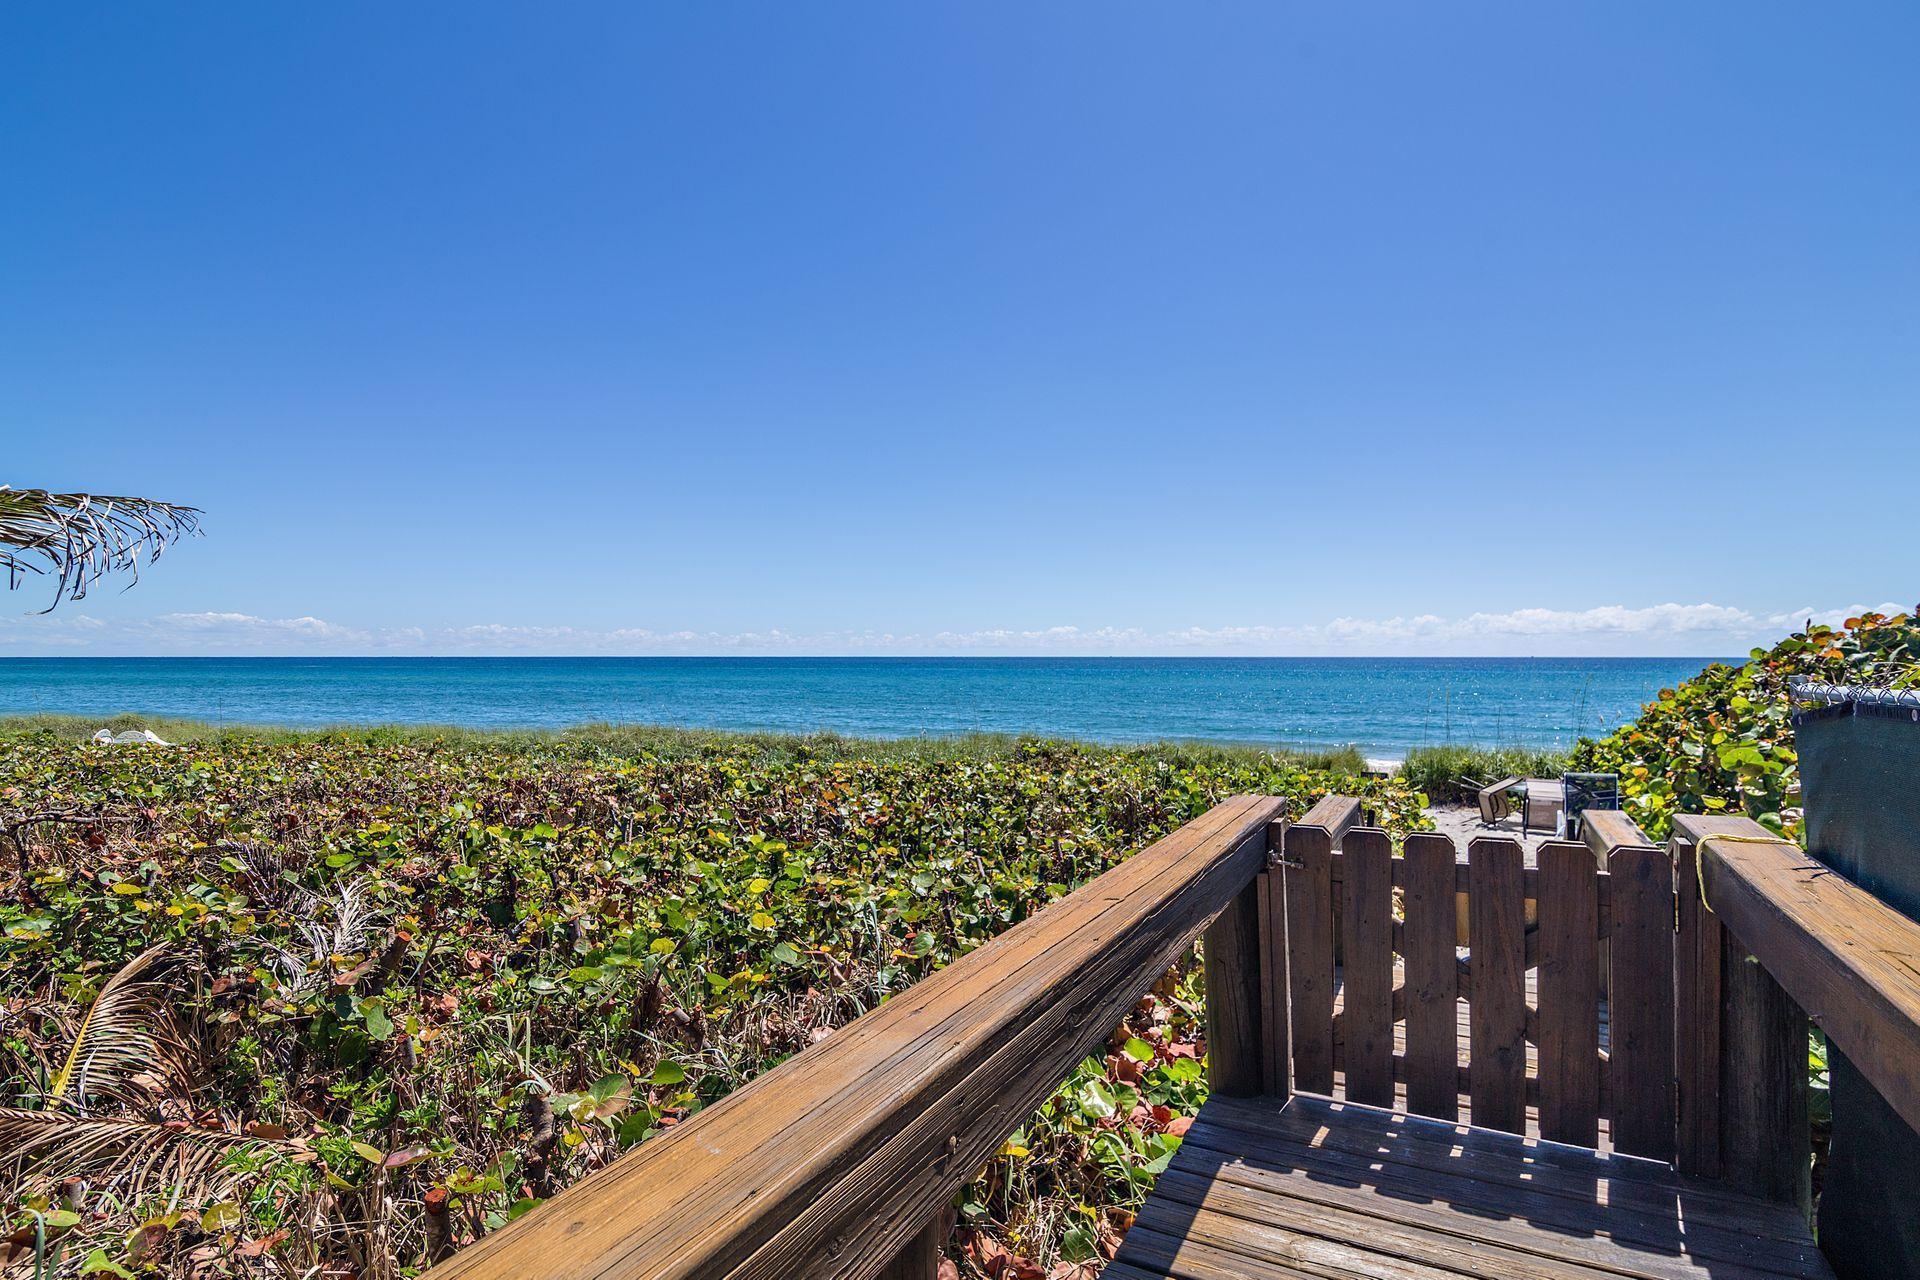 WEXFORD COURT JUNO BEACH FLORIDA